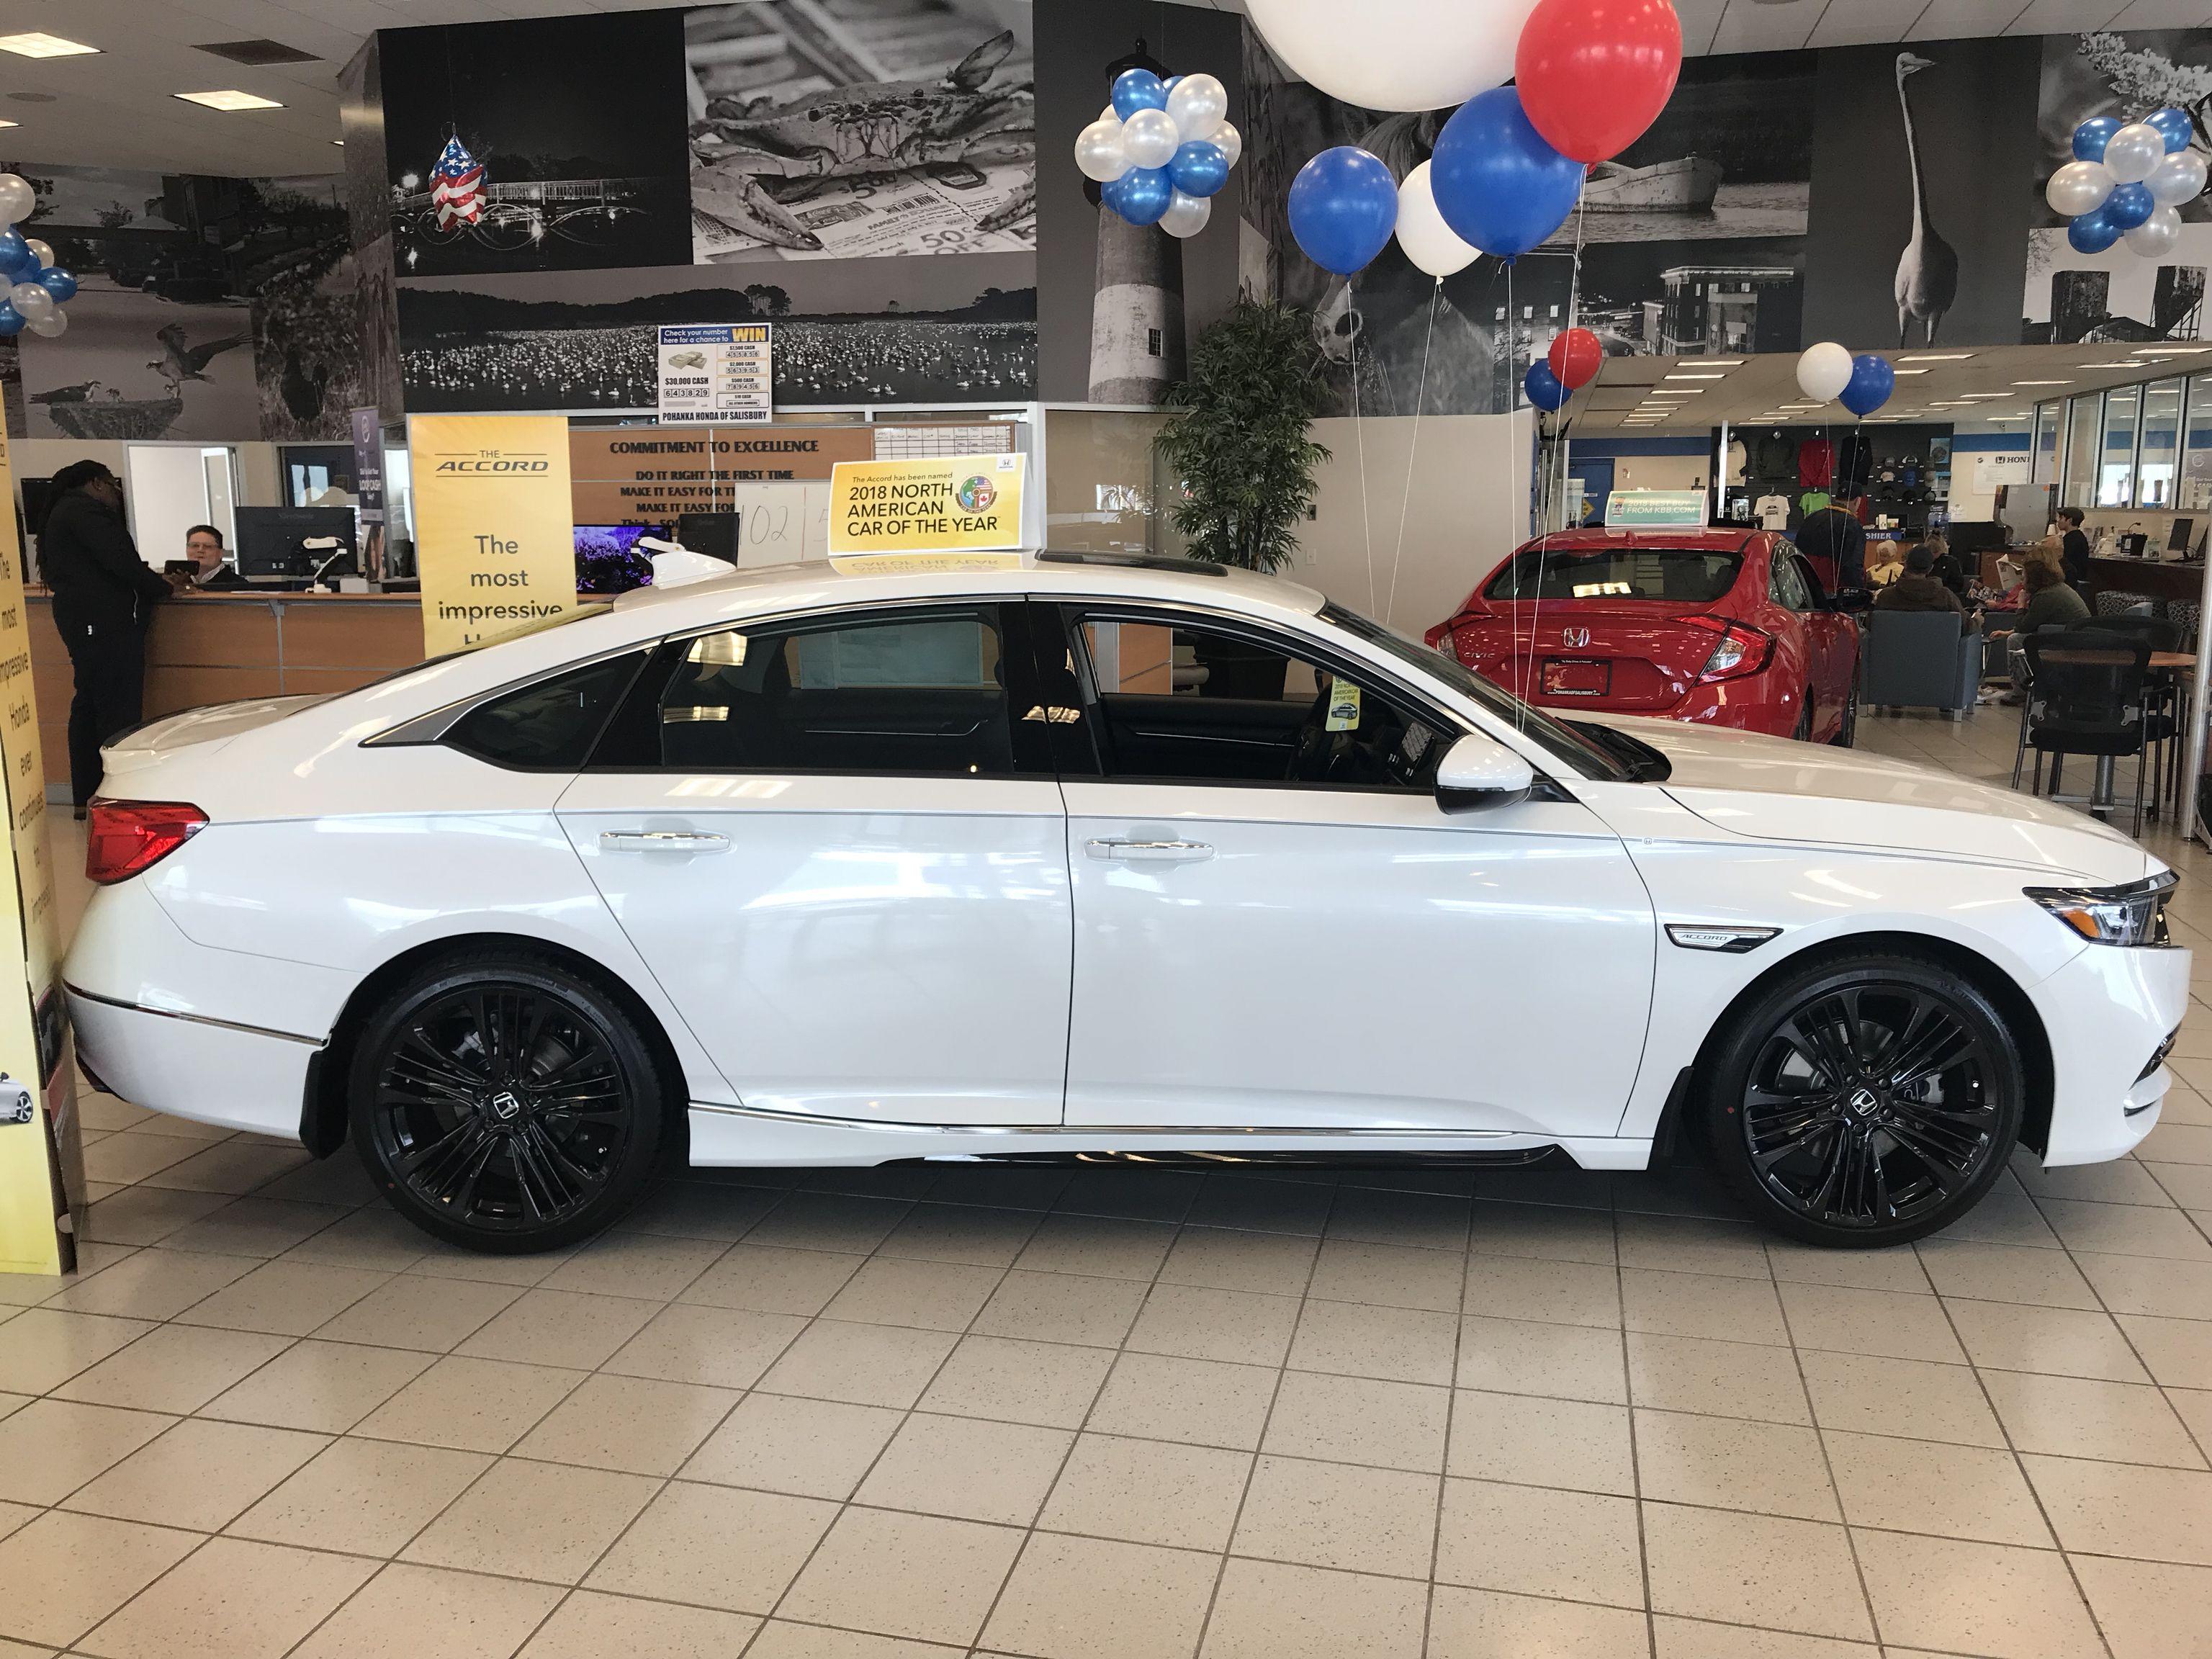 2018 Honda Accord 2.0 Touring Honda accord, 2018 honda